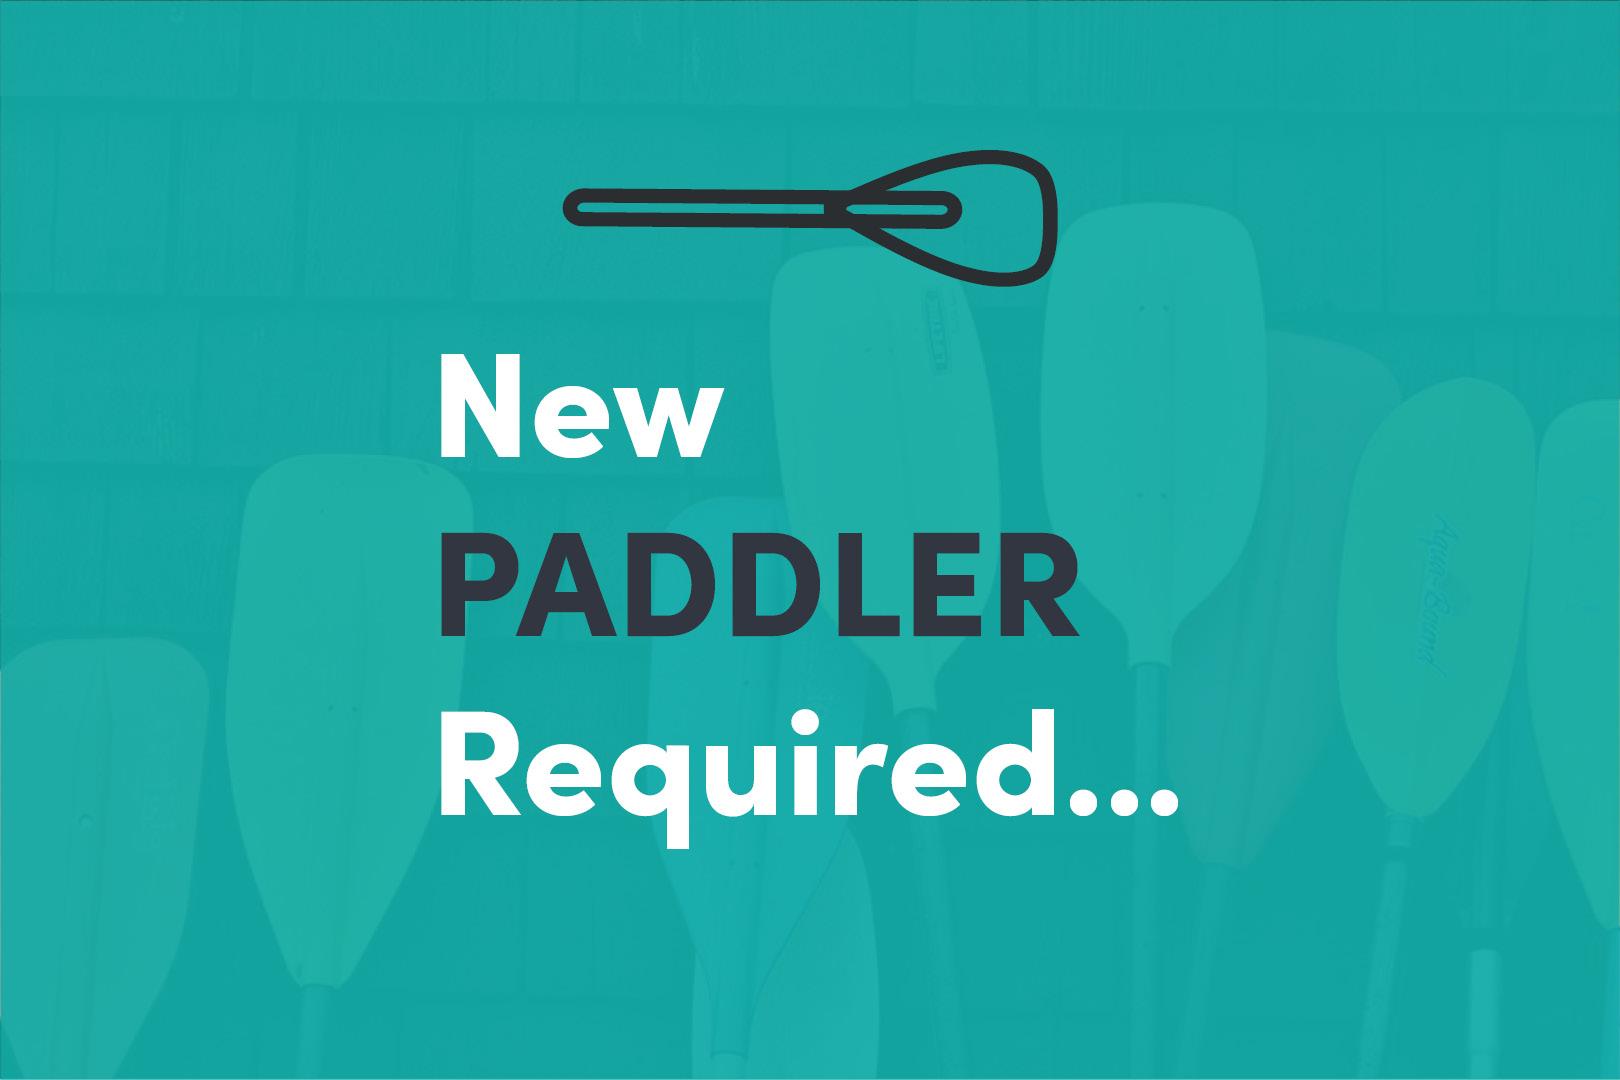 Paddle Creative is Hiring - Marketing Coordinator